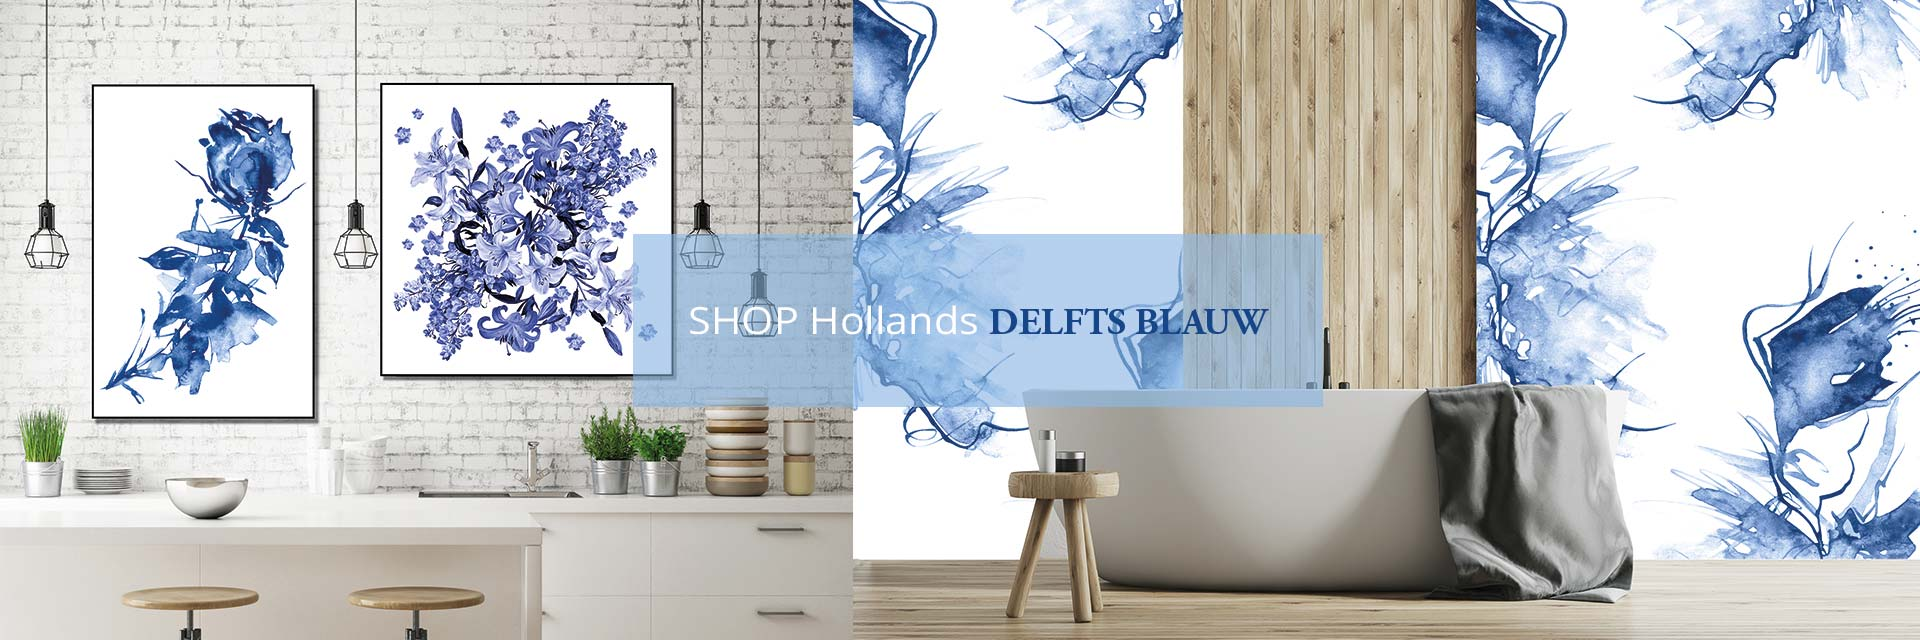 WANDenWOONdeco.nl DELFTS BLAUW